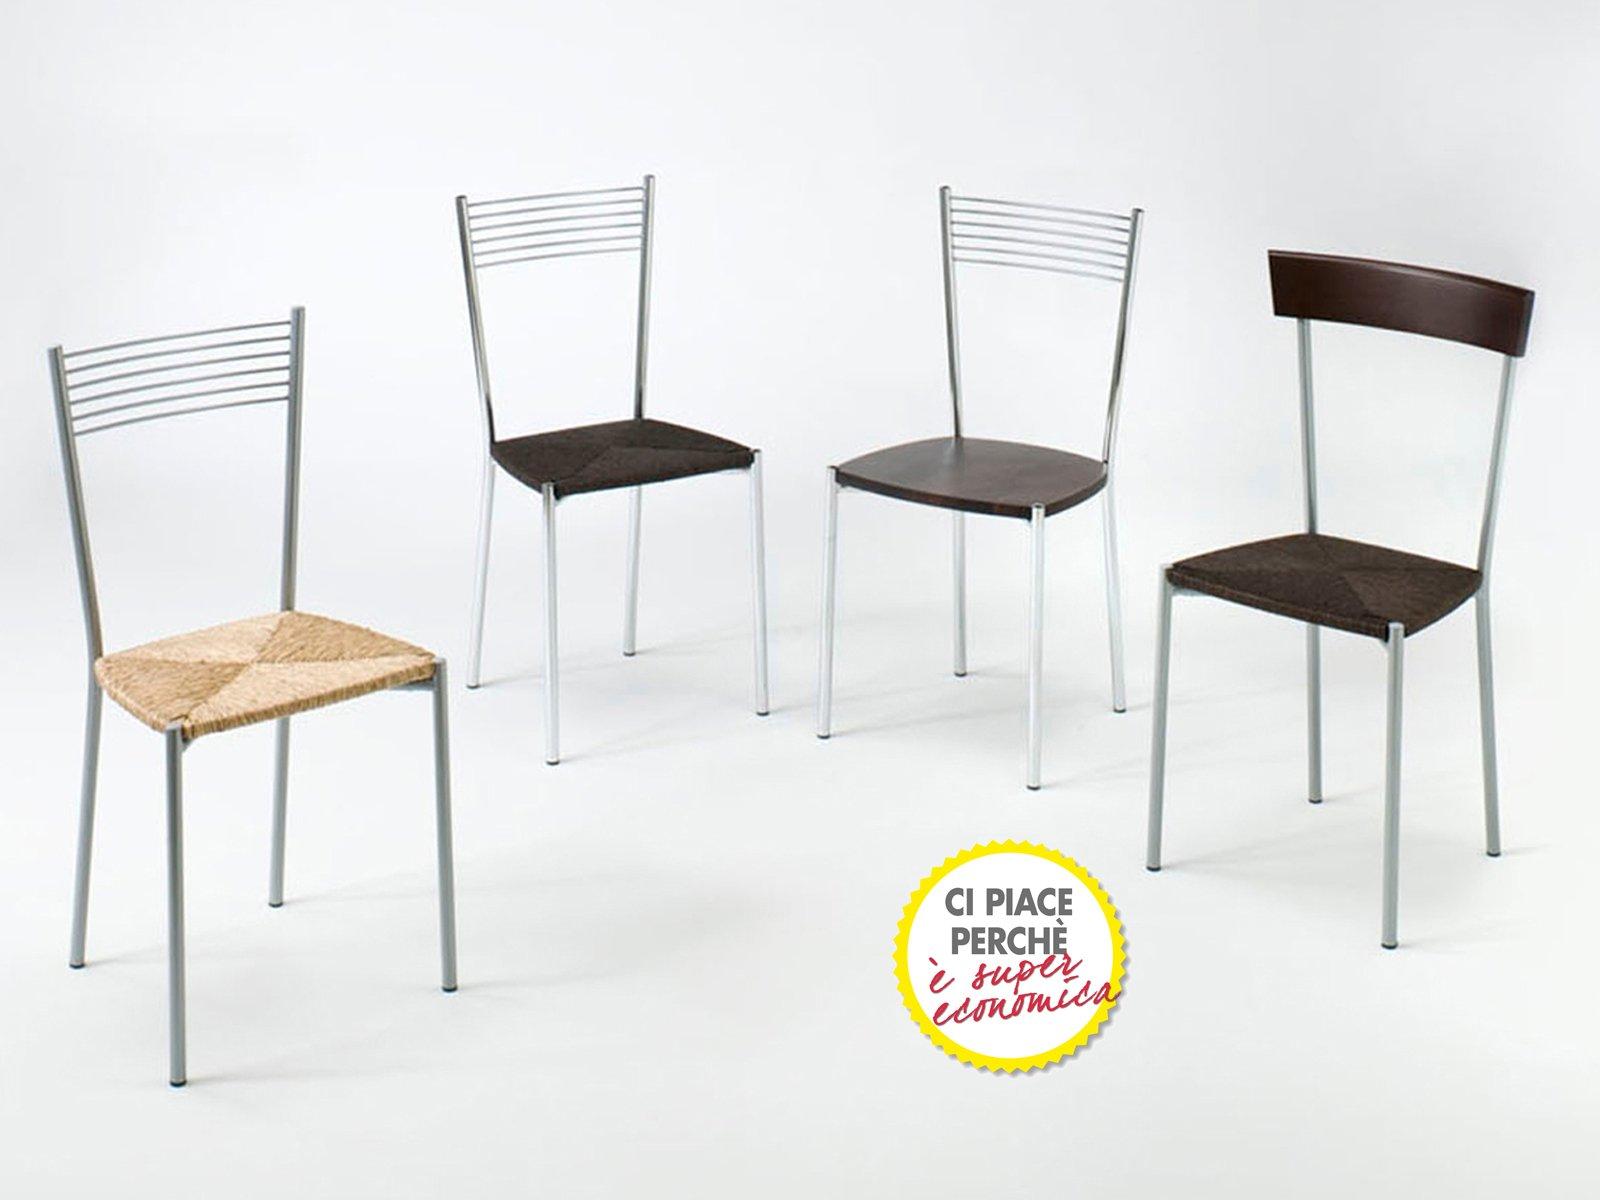 Sedie low cost 15 modelli a meno di 100 euro cose di casa - Sedie da cucina in legno ...